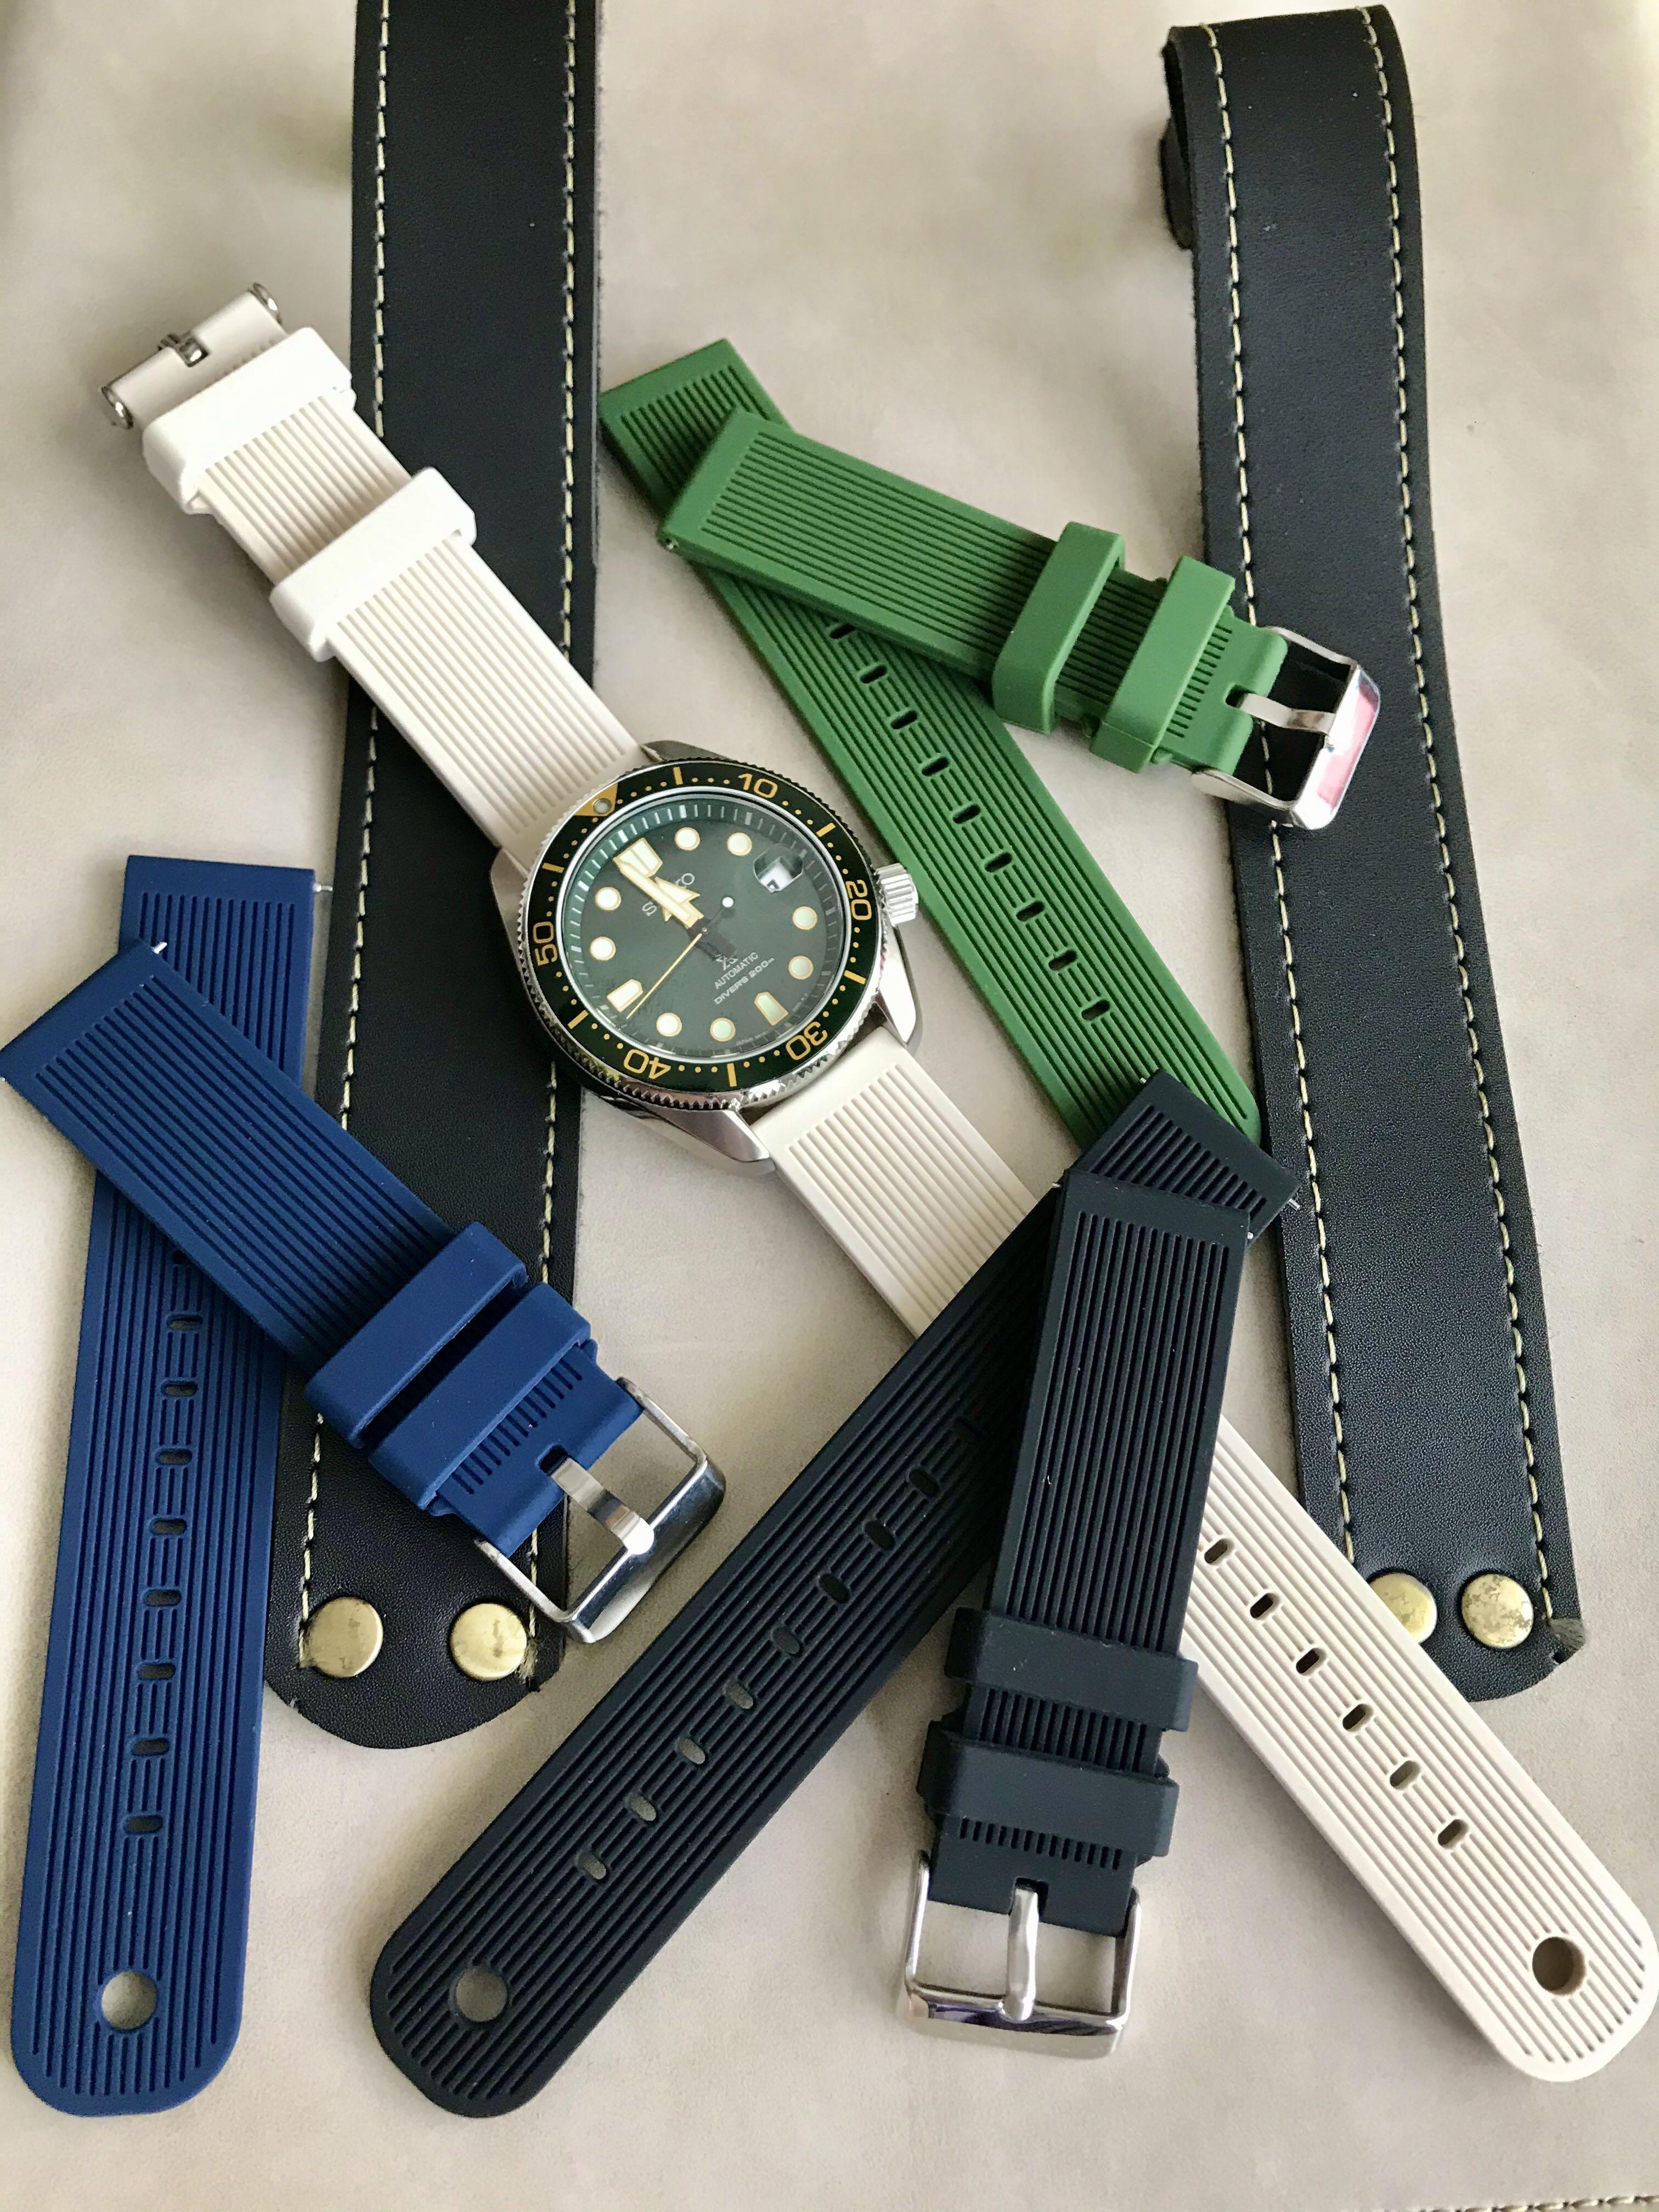 New high quality soft silicone watch strap 20mm for seiko omega rolex tudor